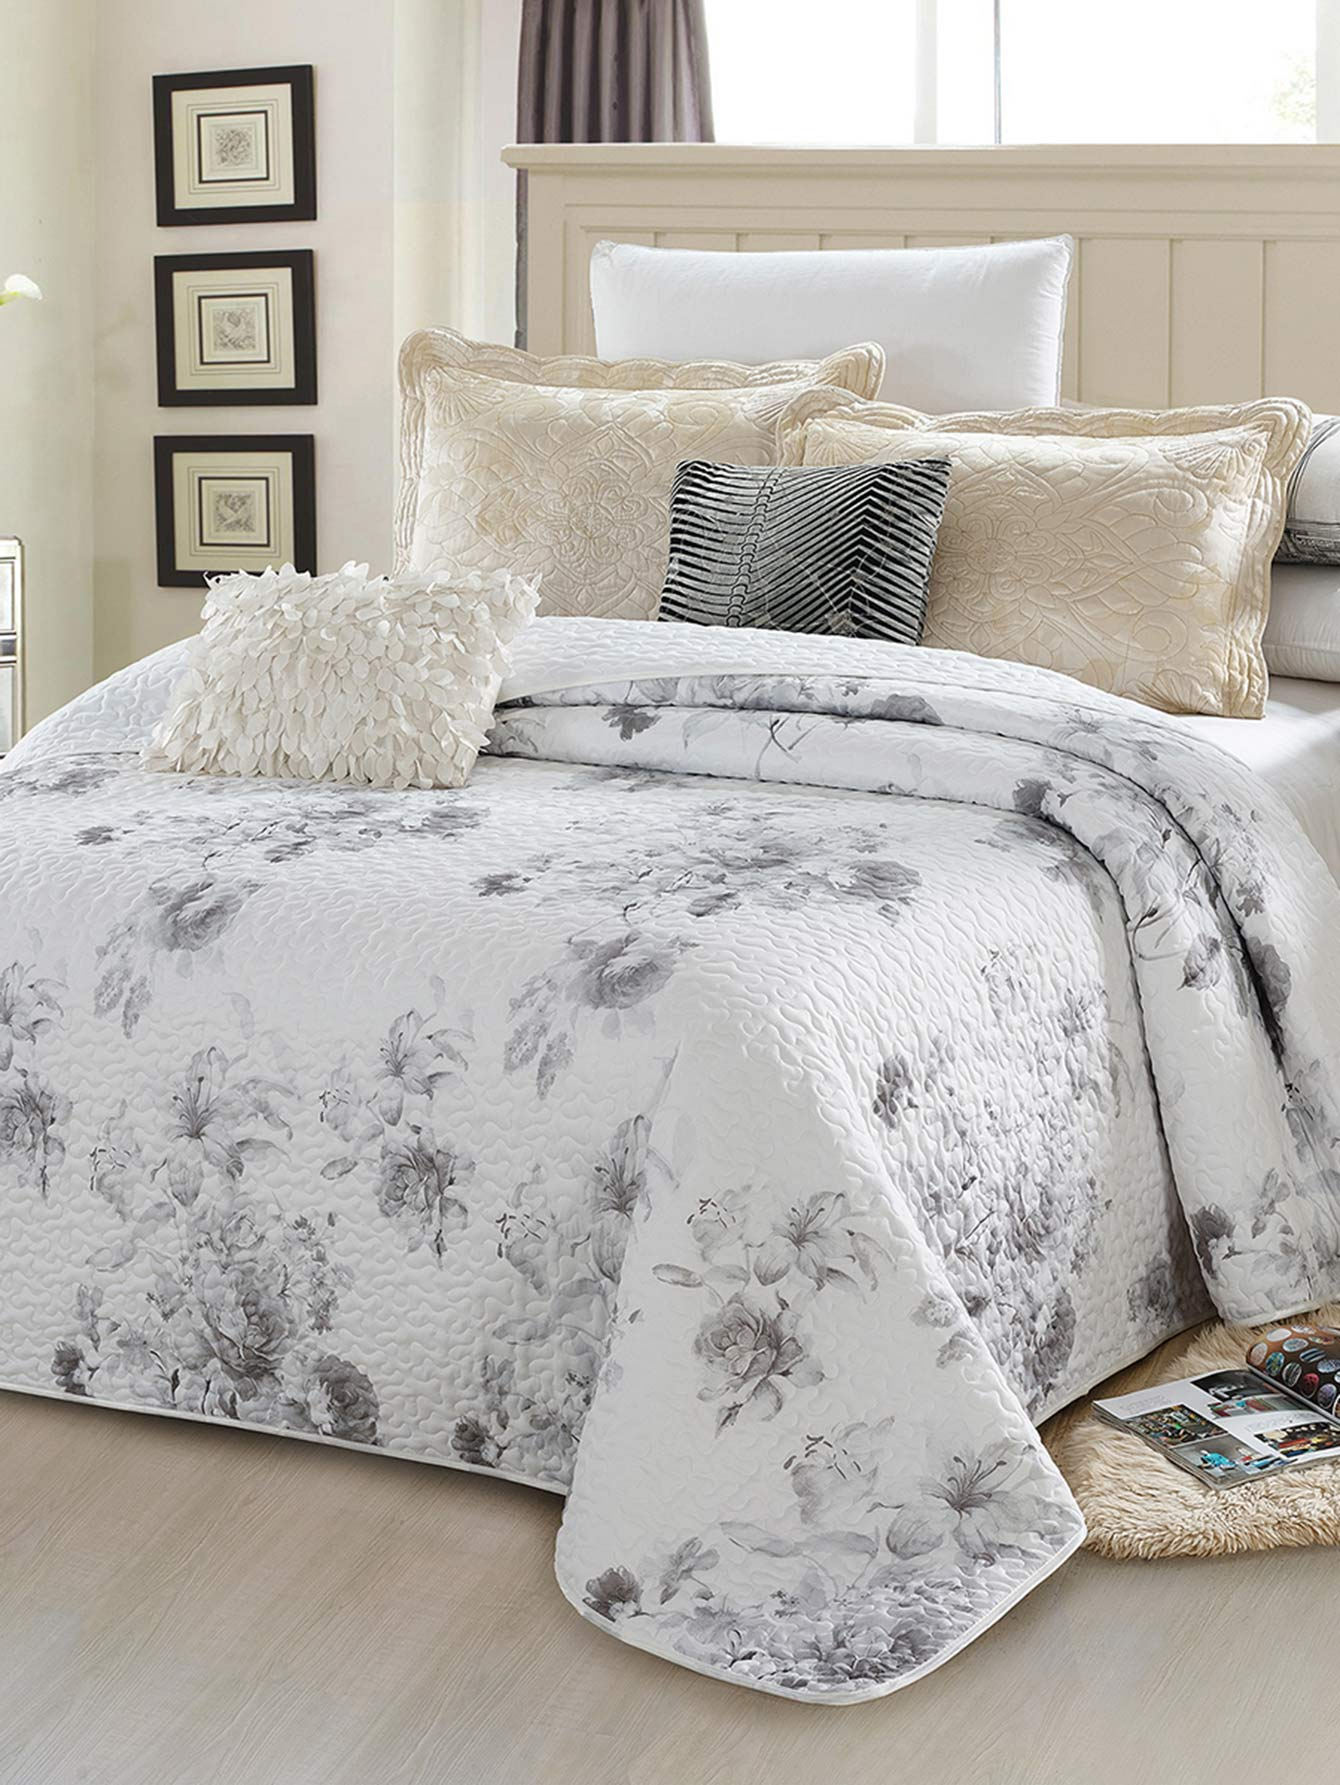 Allover Flower Print Bedspread